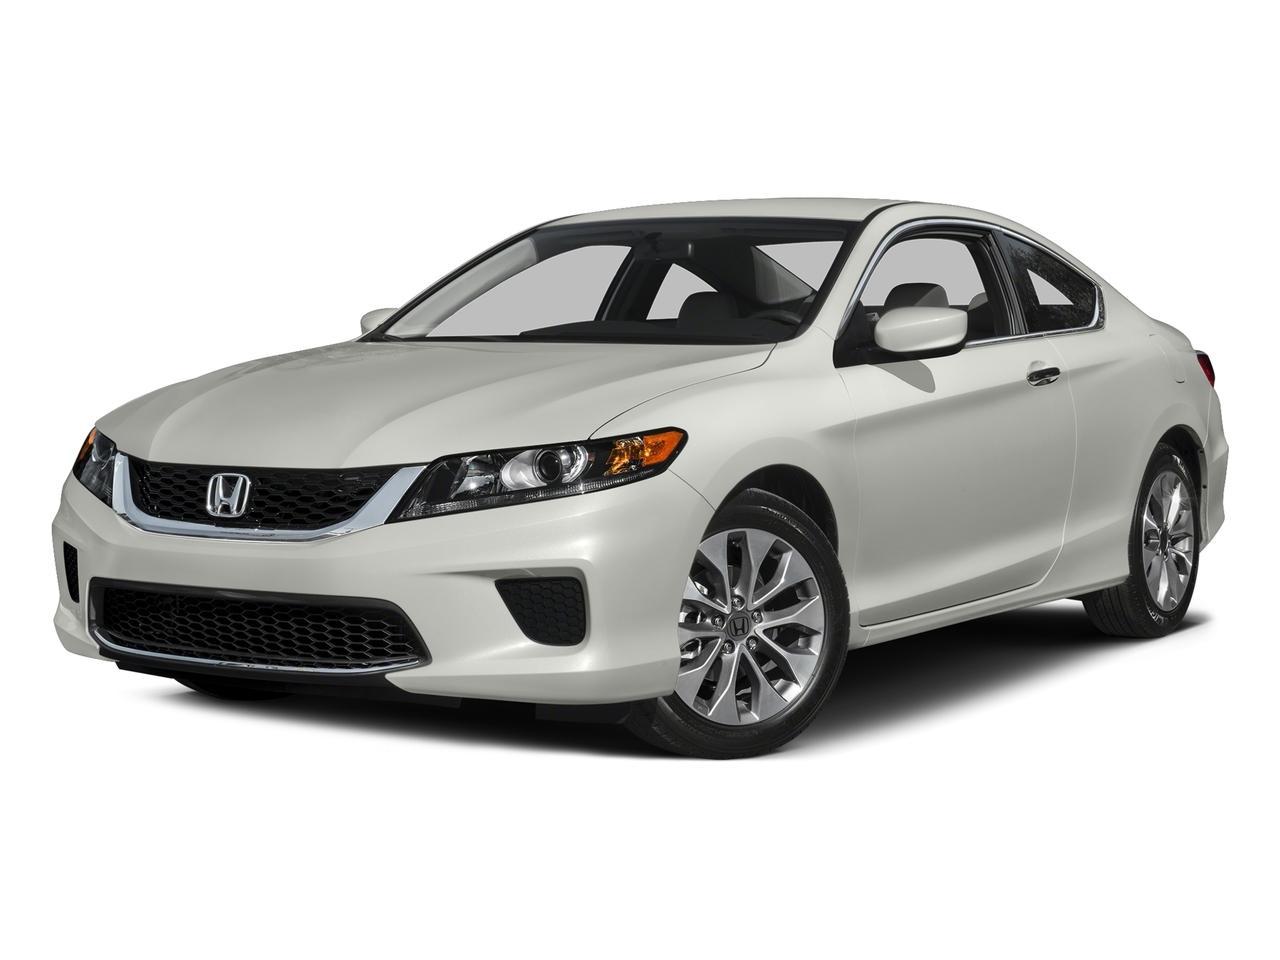 2015 Honda Accord Coupe Vehicle Photo in Pittsburg, CA 94565